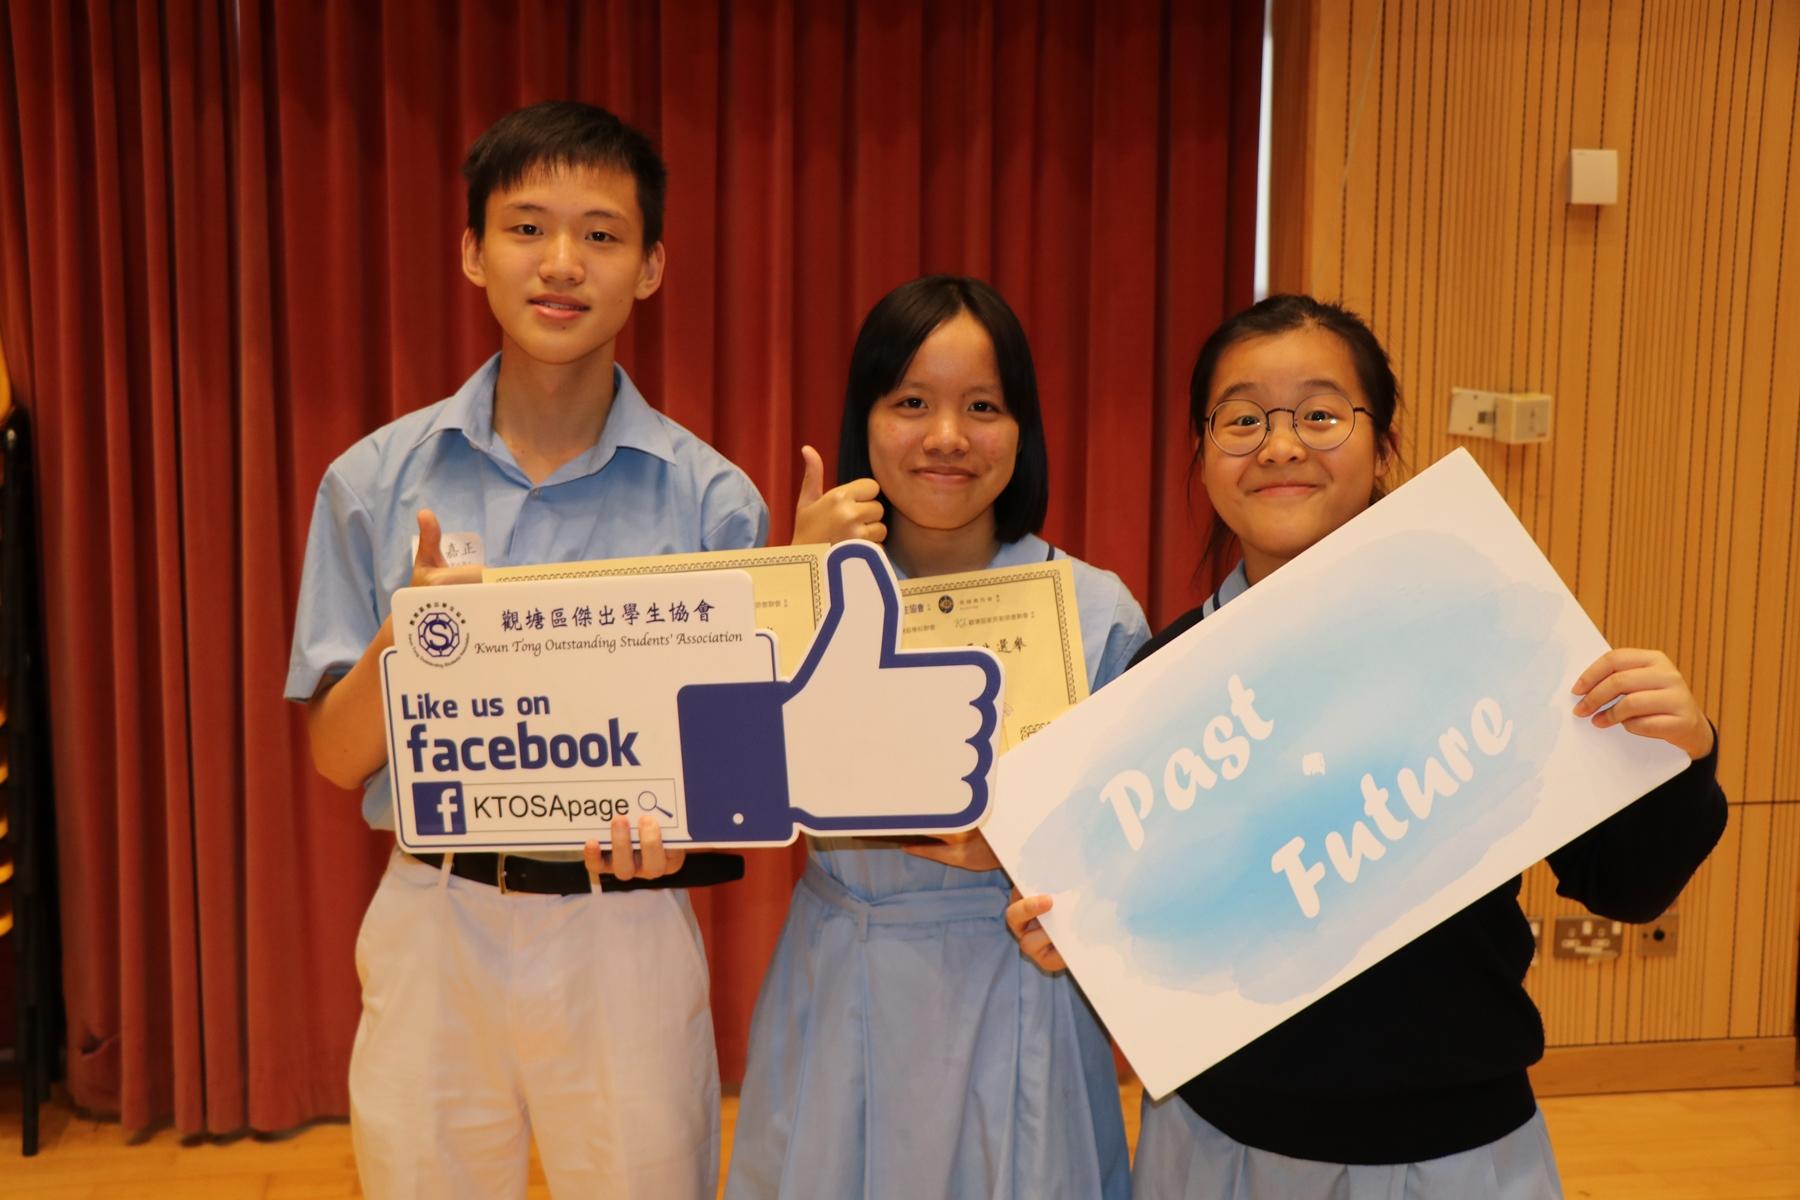 http://npc.edu.hk/sites/default/files/img_5821.jpg